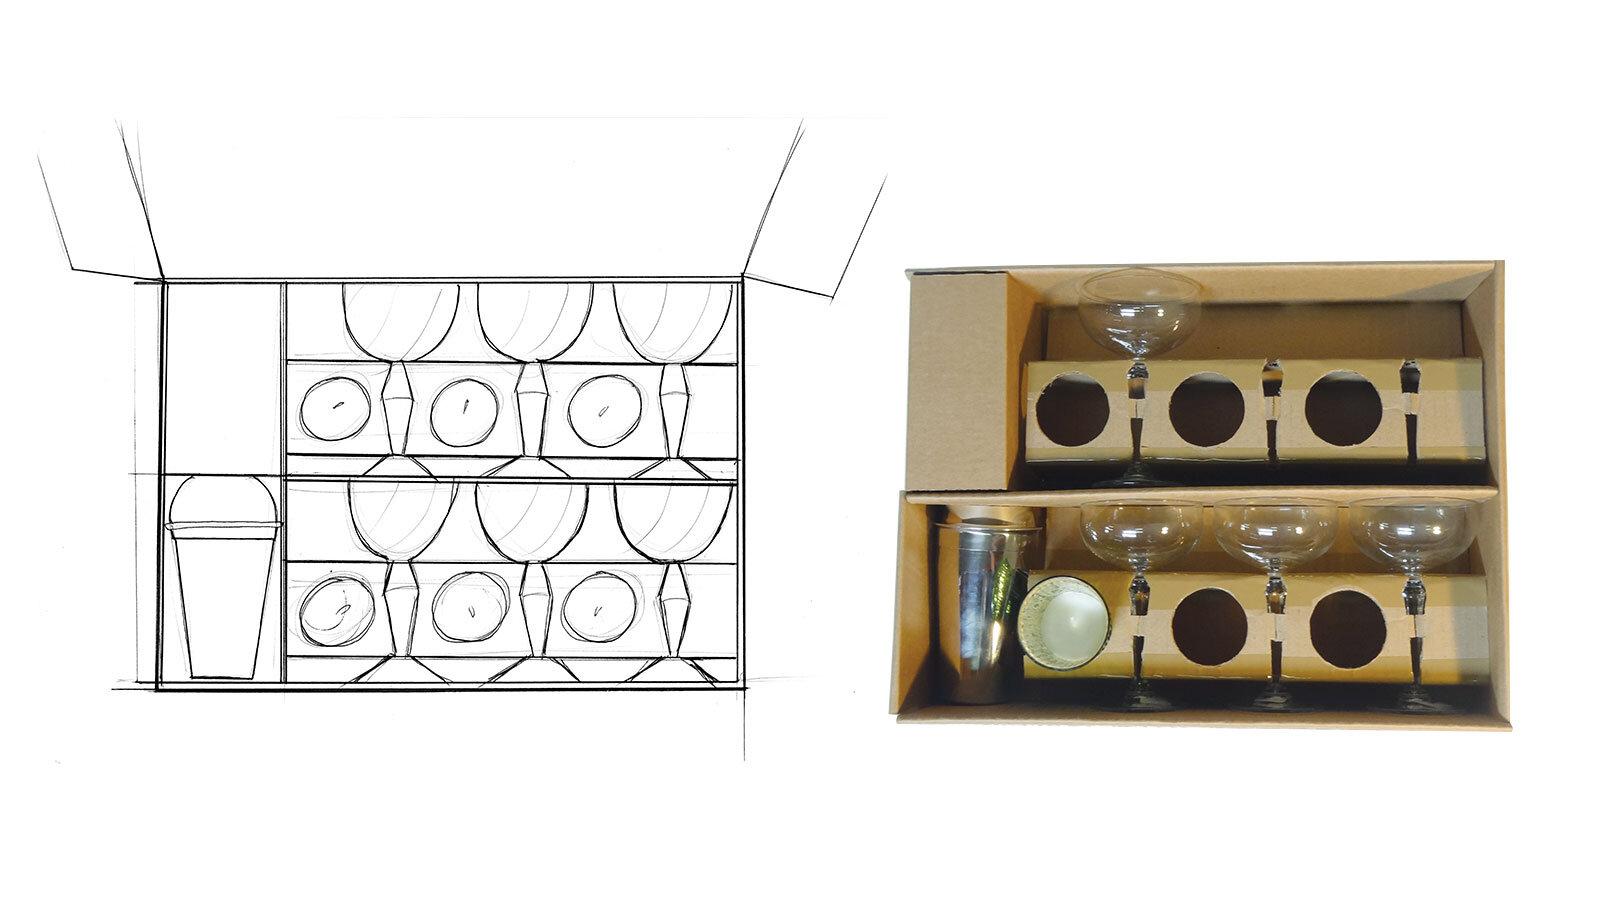 West-Elm-Box-Packaging-Company-Design-1.JPG